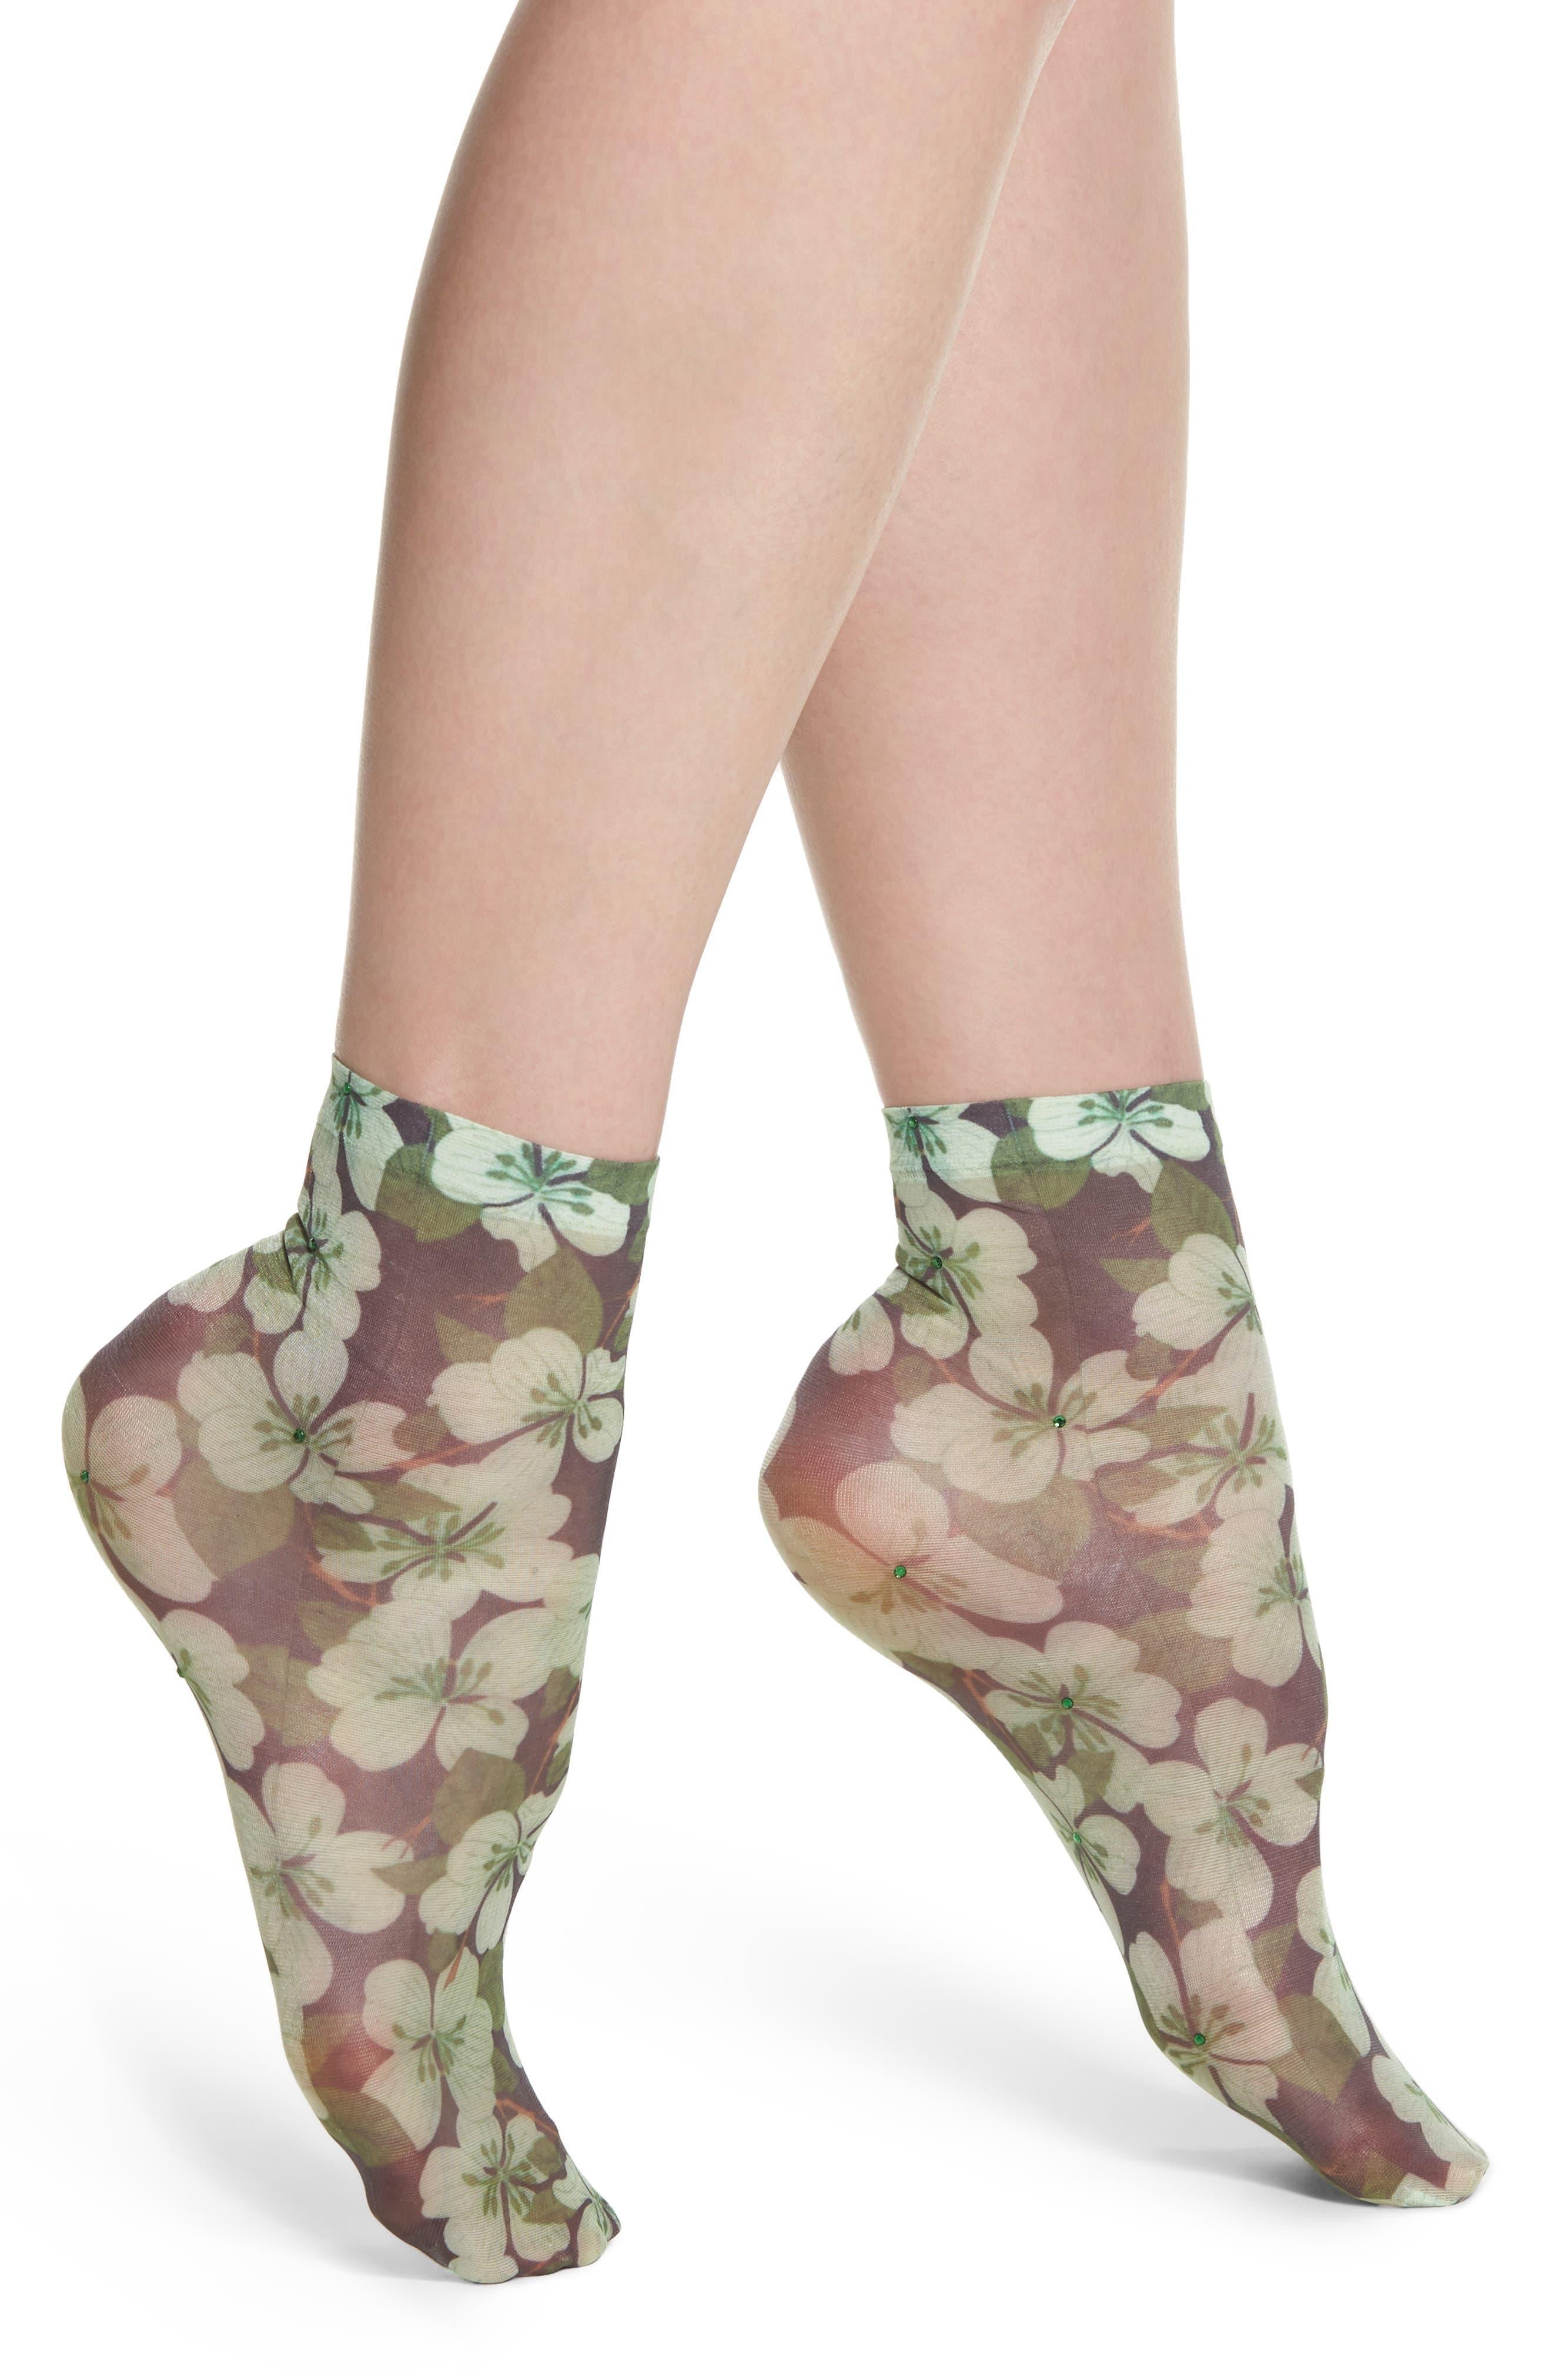 Annavittoria Ankle Socks,                         Main,                         color, Fiore Strass